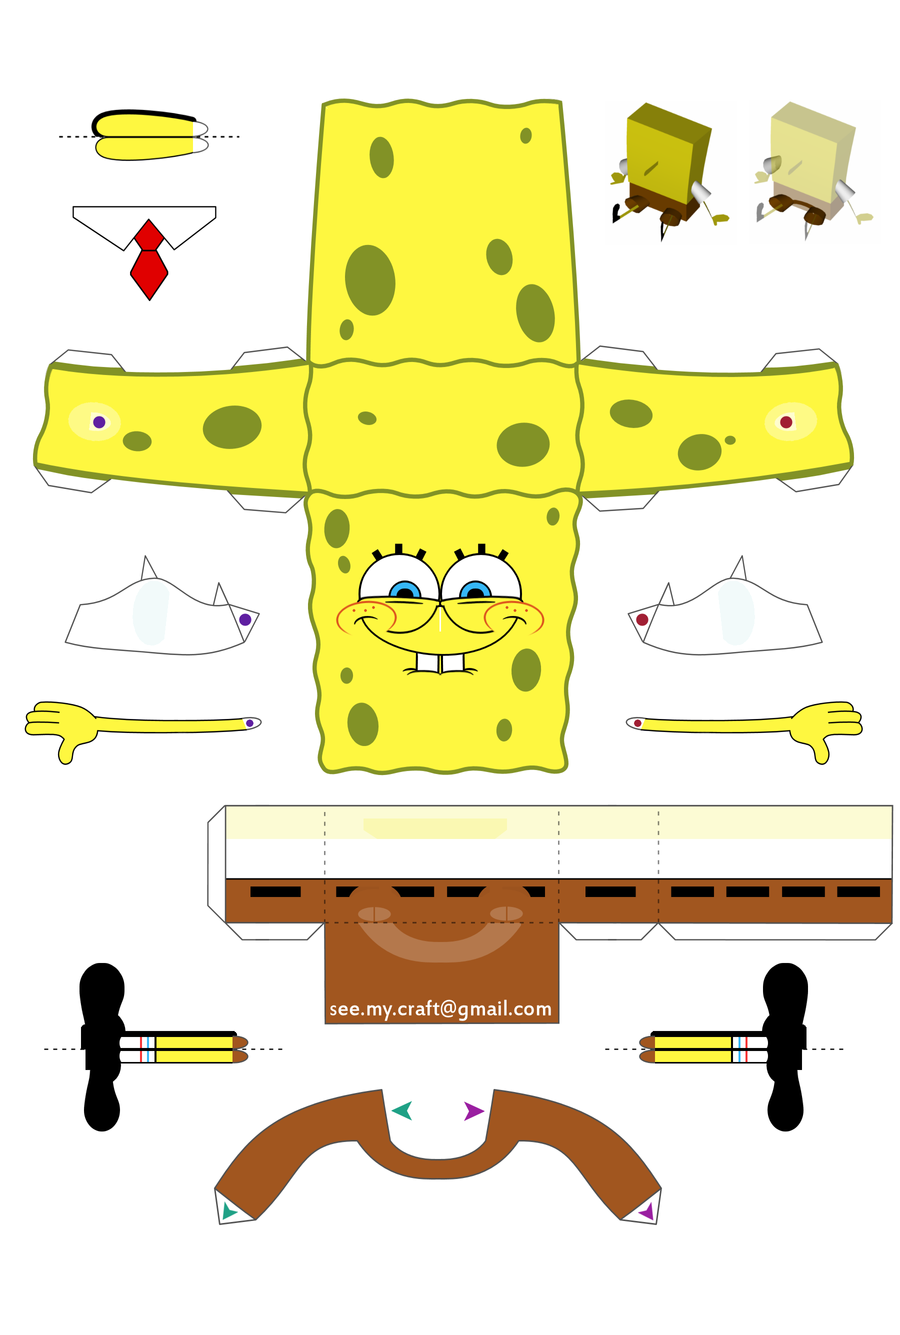 Spongebob Papercraft - Instructions by kamibox